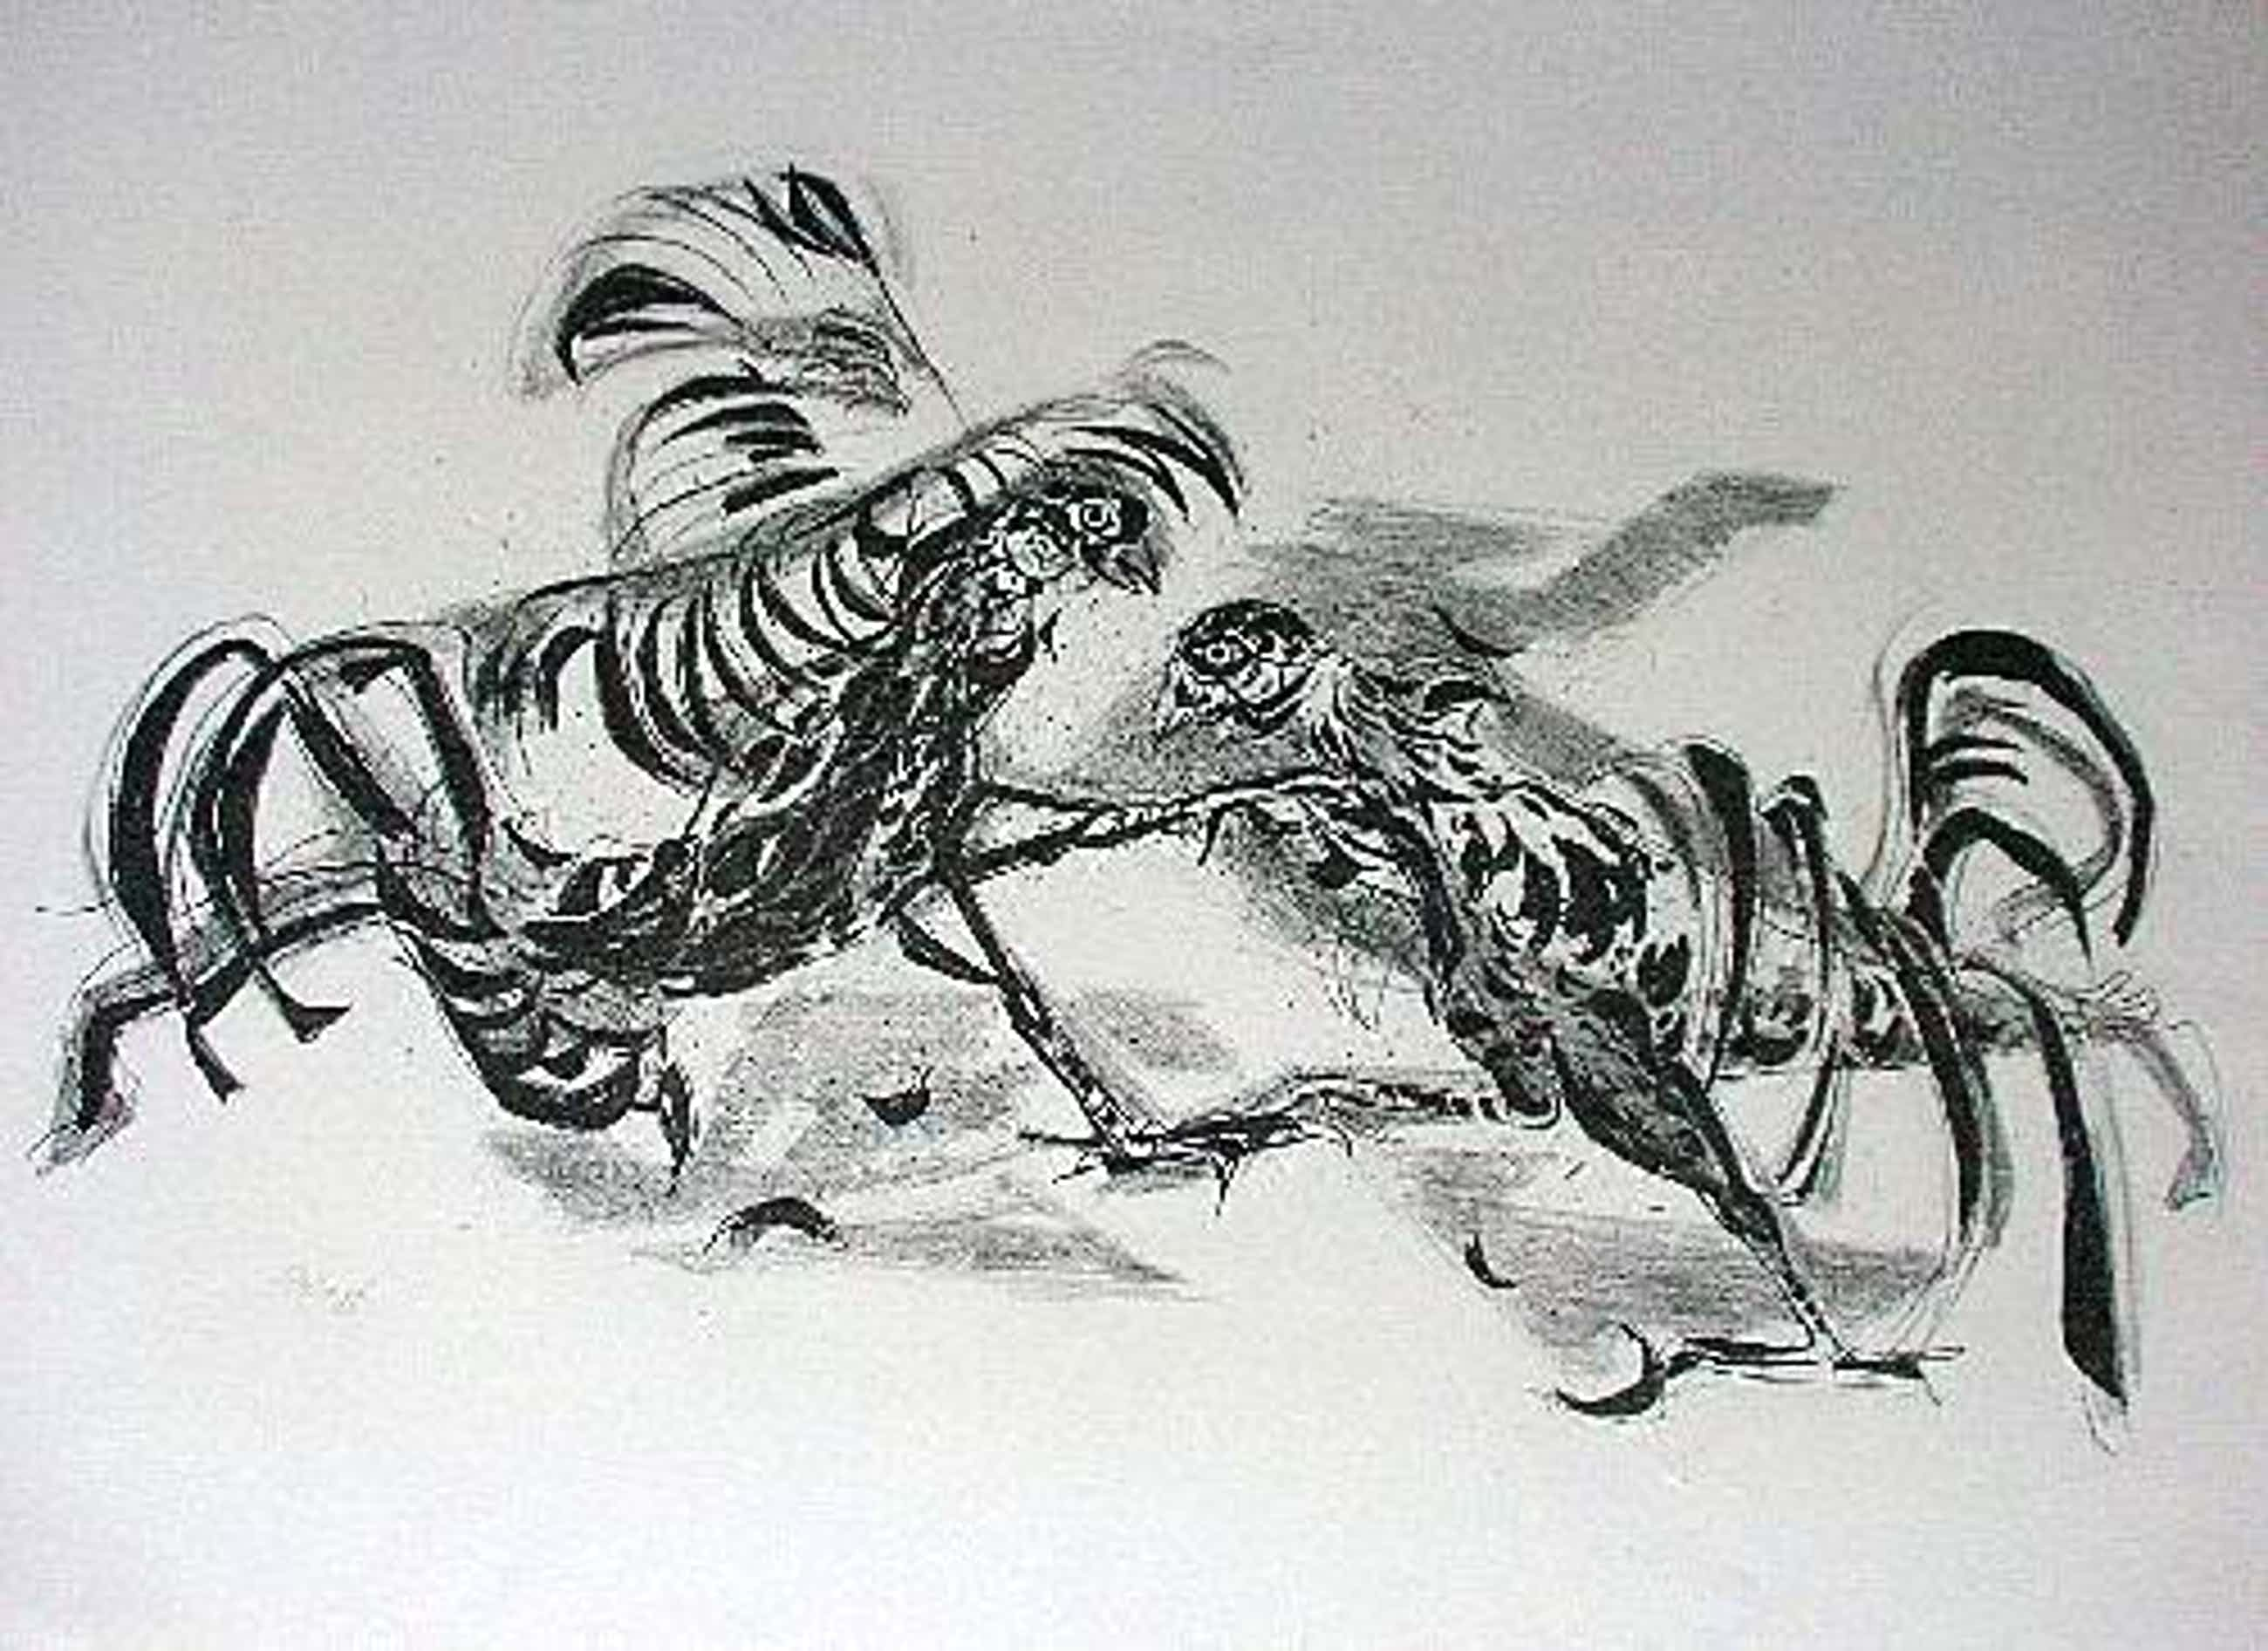 Eduard Hopf - Orig. Lithographie 1955, Hahnenkampf, signiert kopen? Bied vanaf 40!